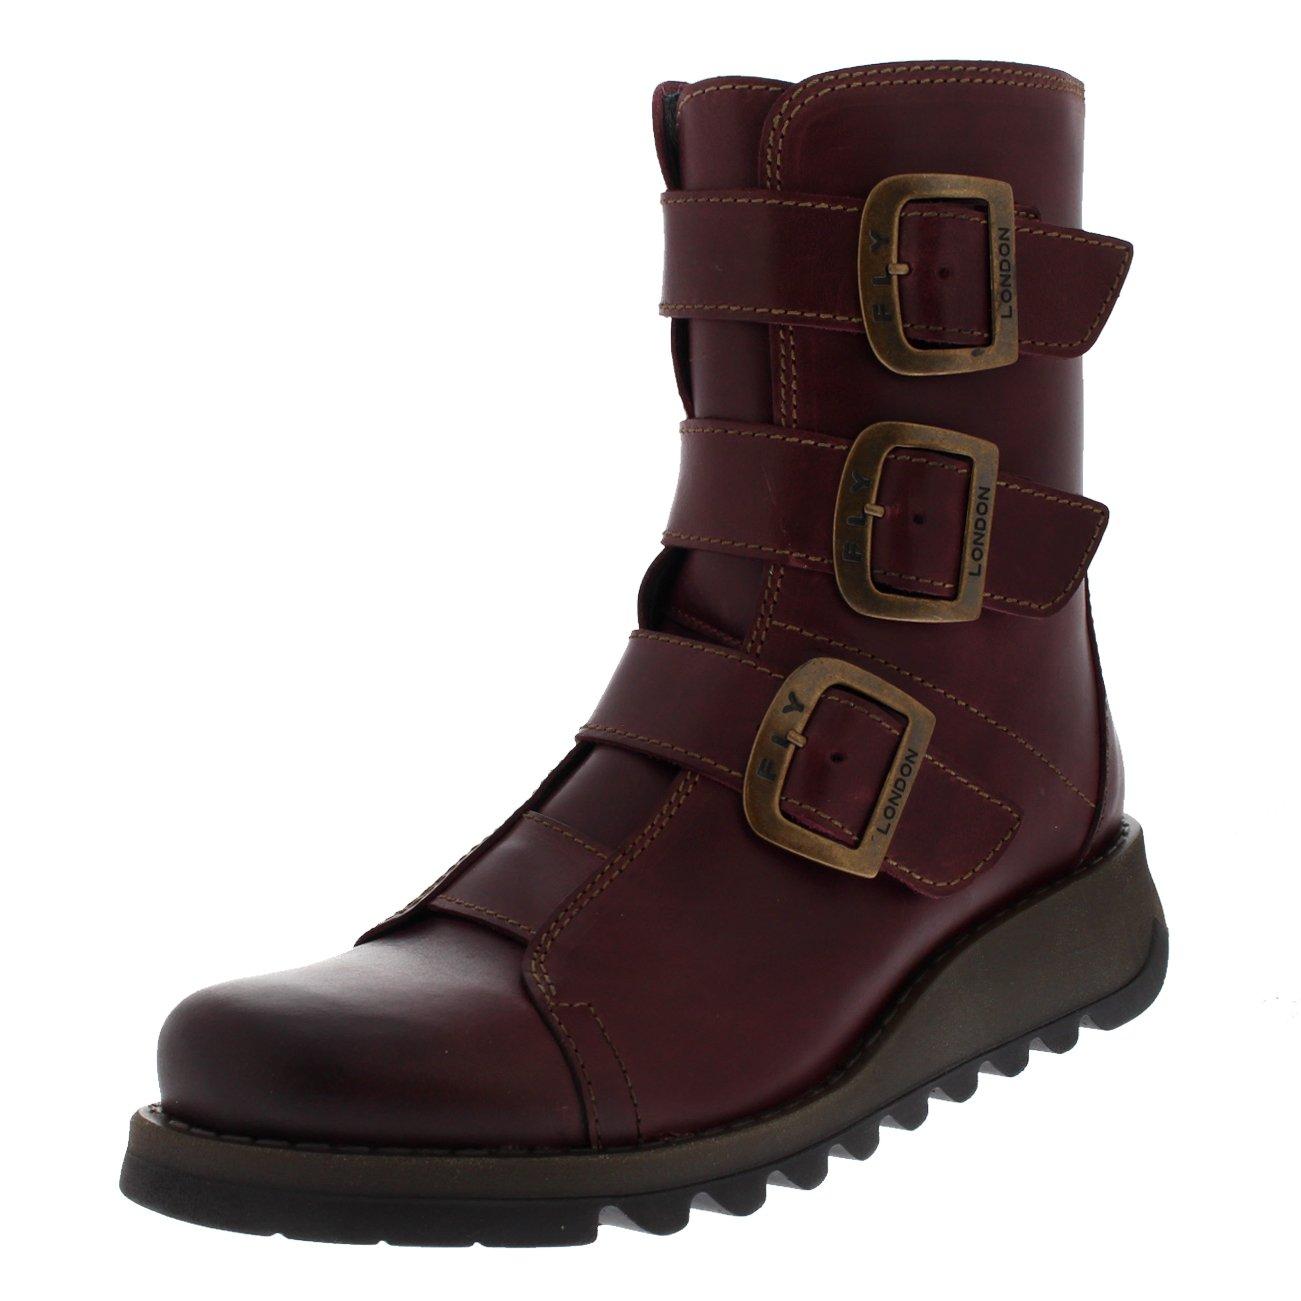 Womens Fly London Scop Rug Wedge Heel Leather Winter Biker Ankle Boots - Rug Purple - 7